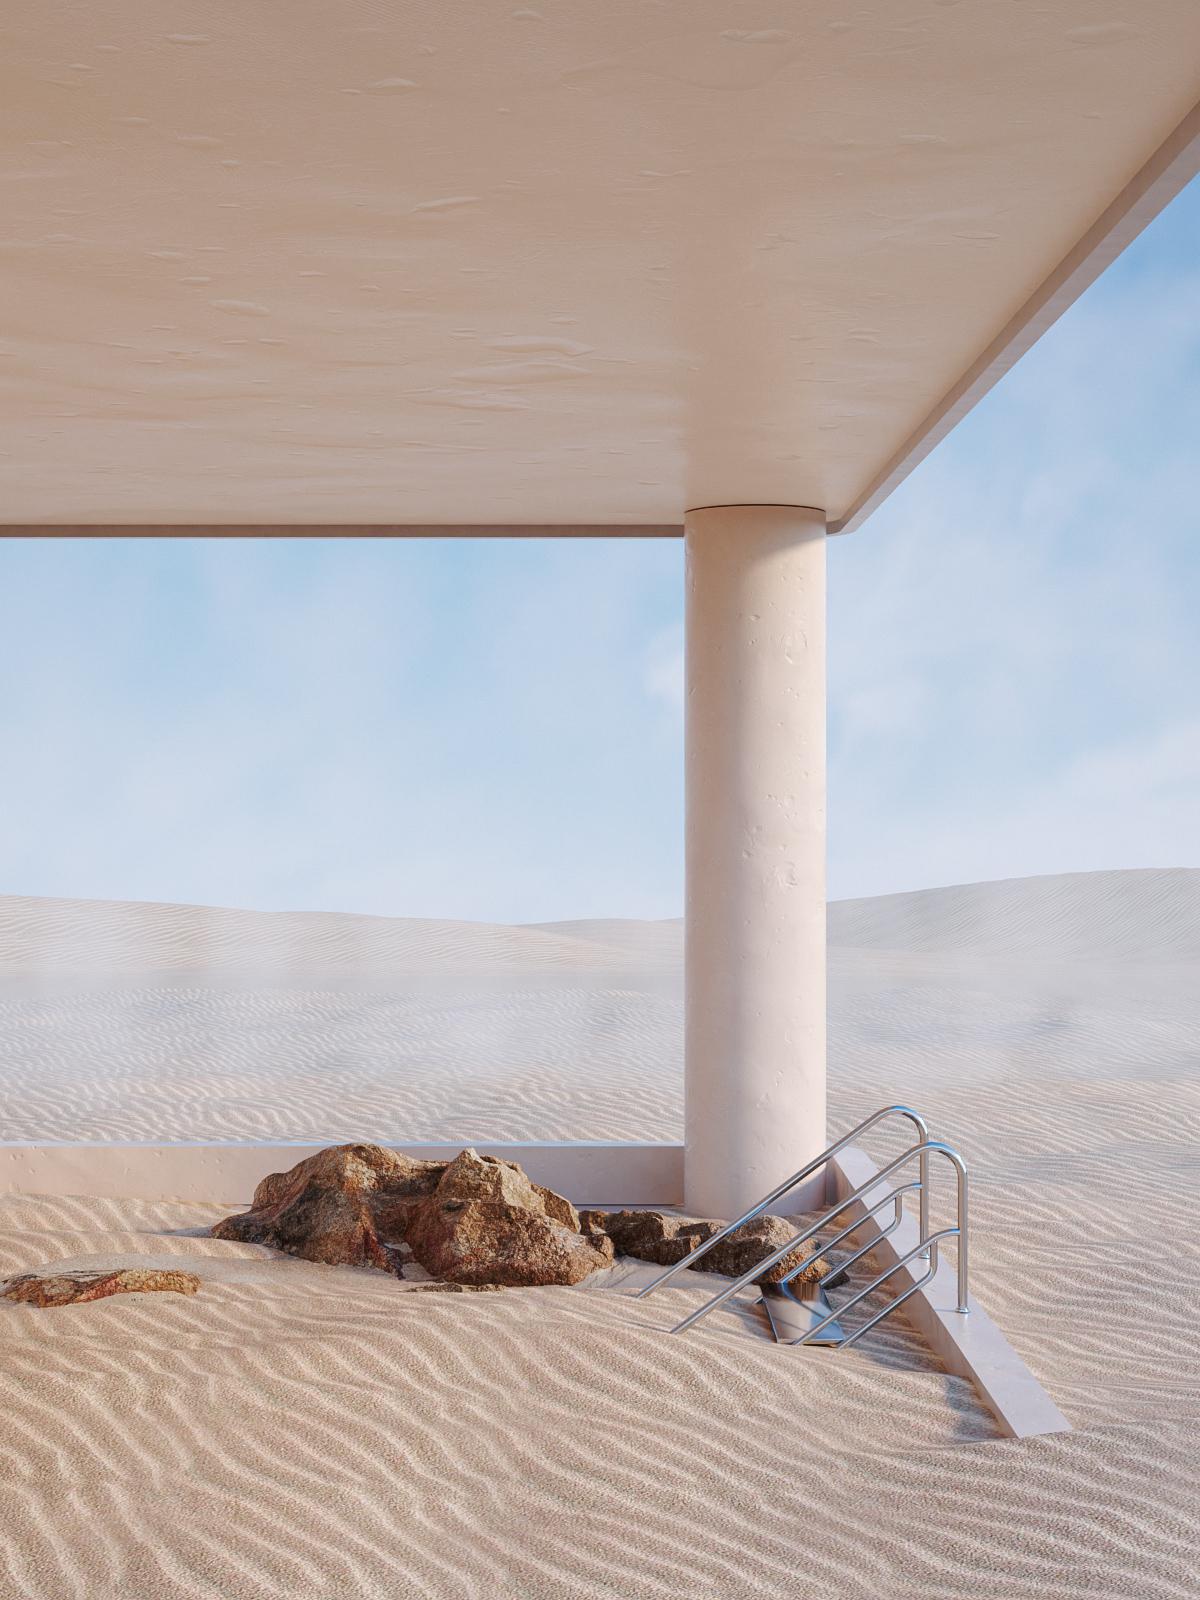 balkon_004_cc_insta_kaeptive_02